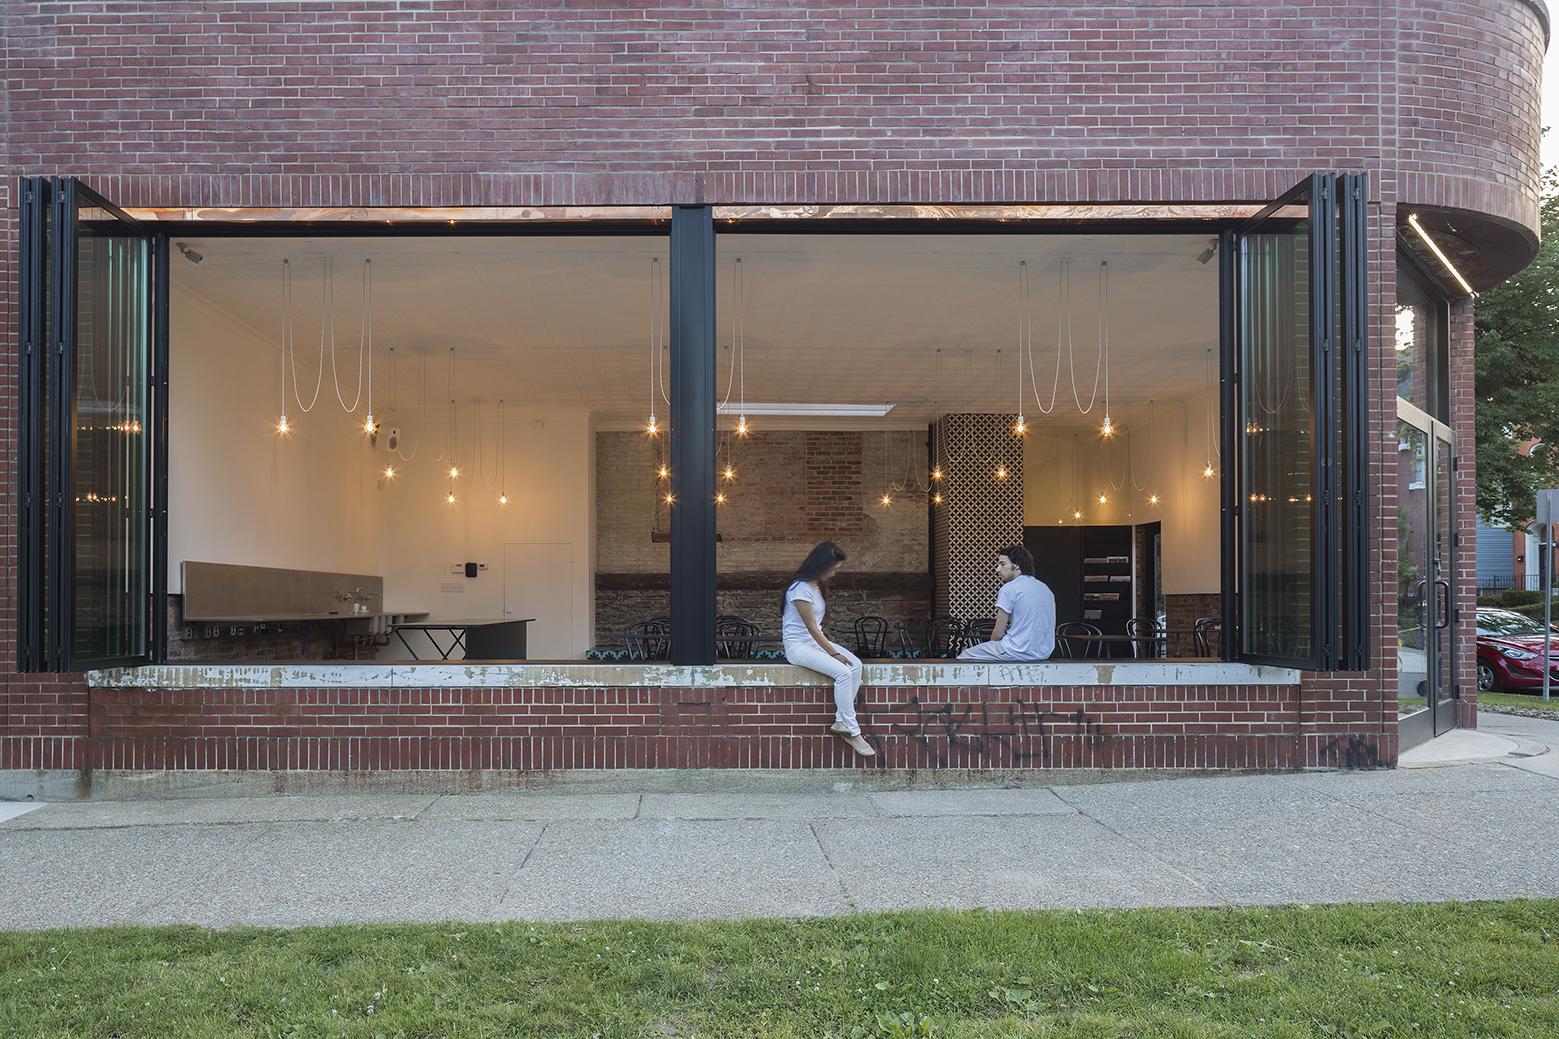 22 cafe fargo Cafe Fargo By Davidson Rafailidis